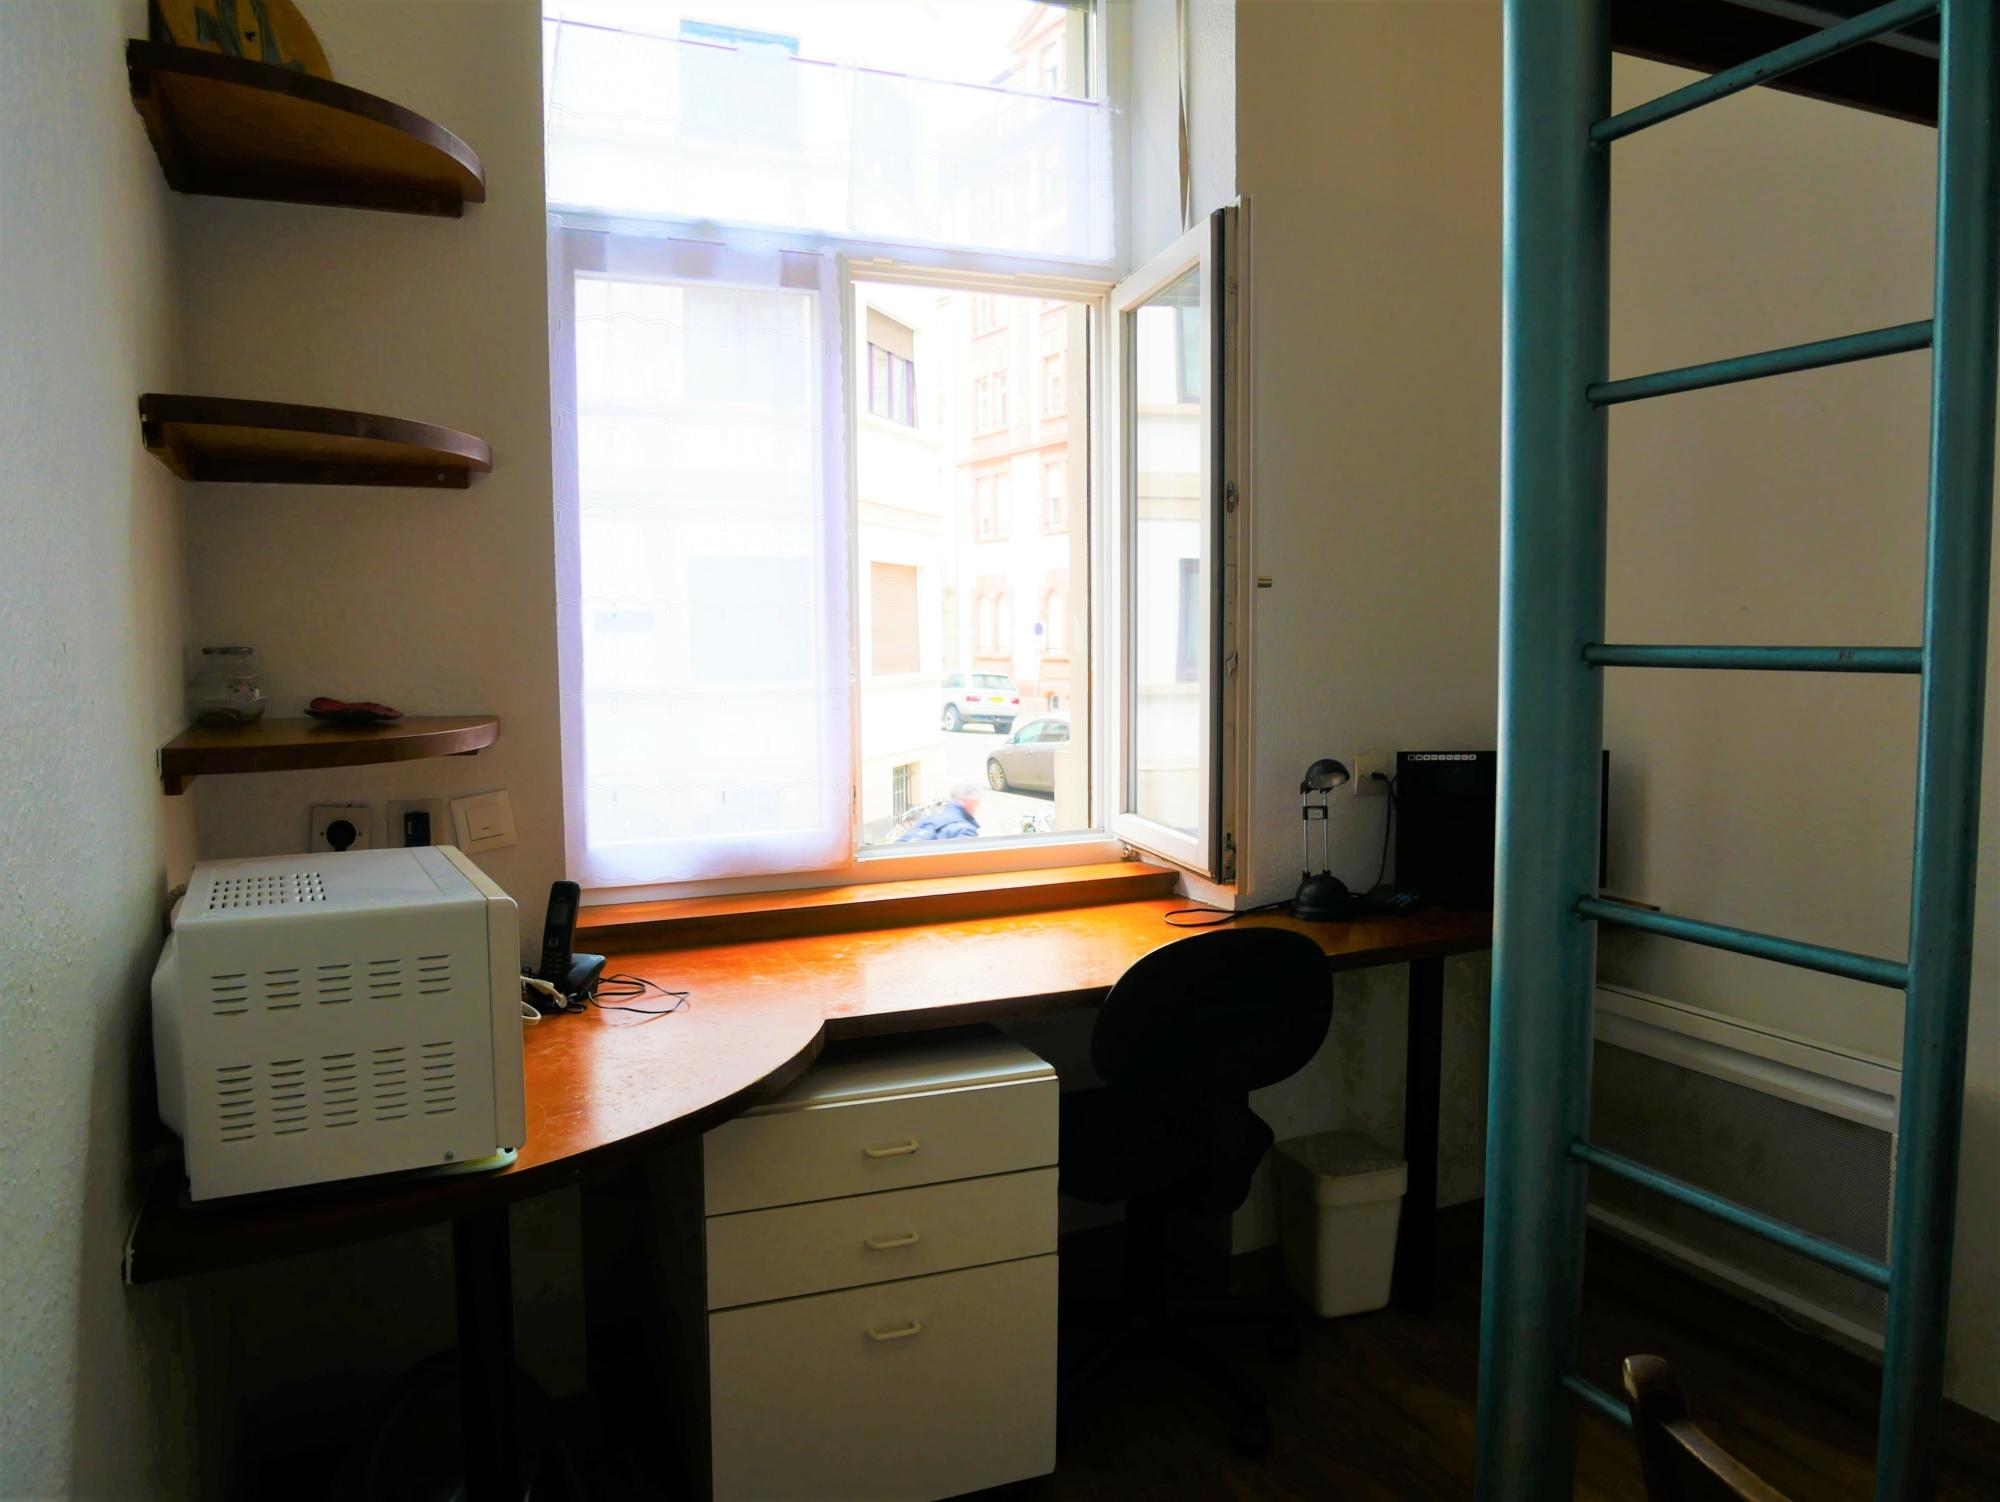 [Tiny] Chambre meublée - Av. des Vosges / rue Sellenick - nos locations - Beausite Immobilier 1